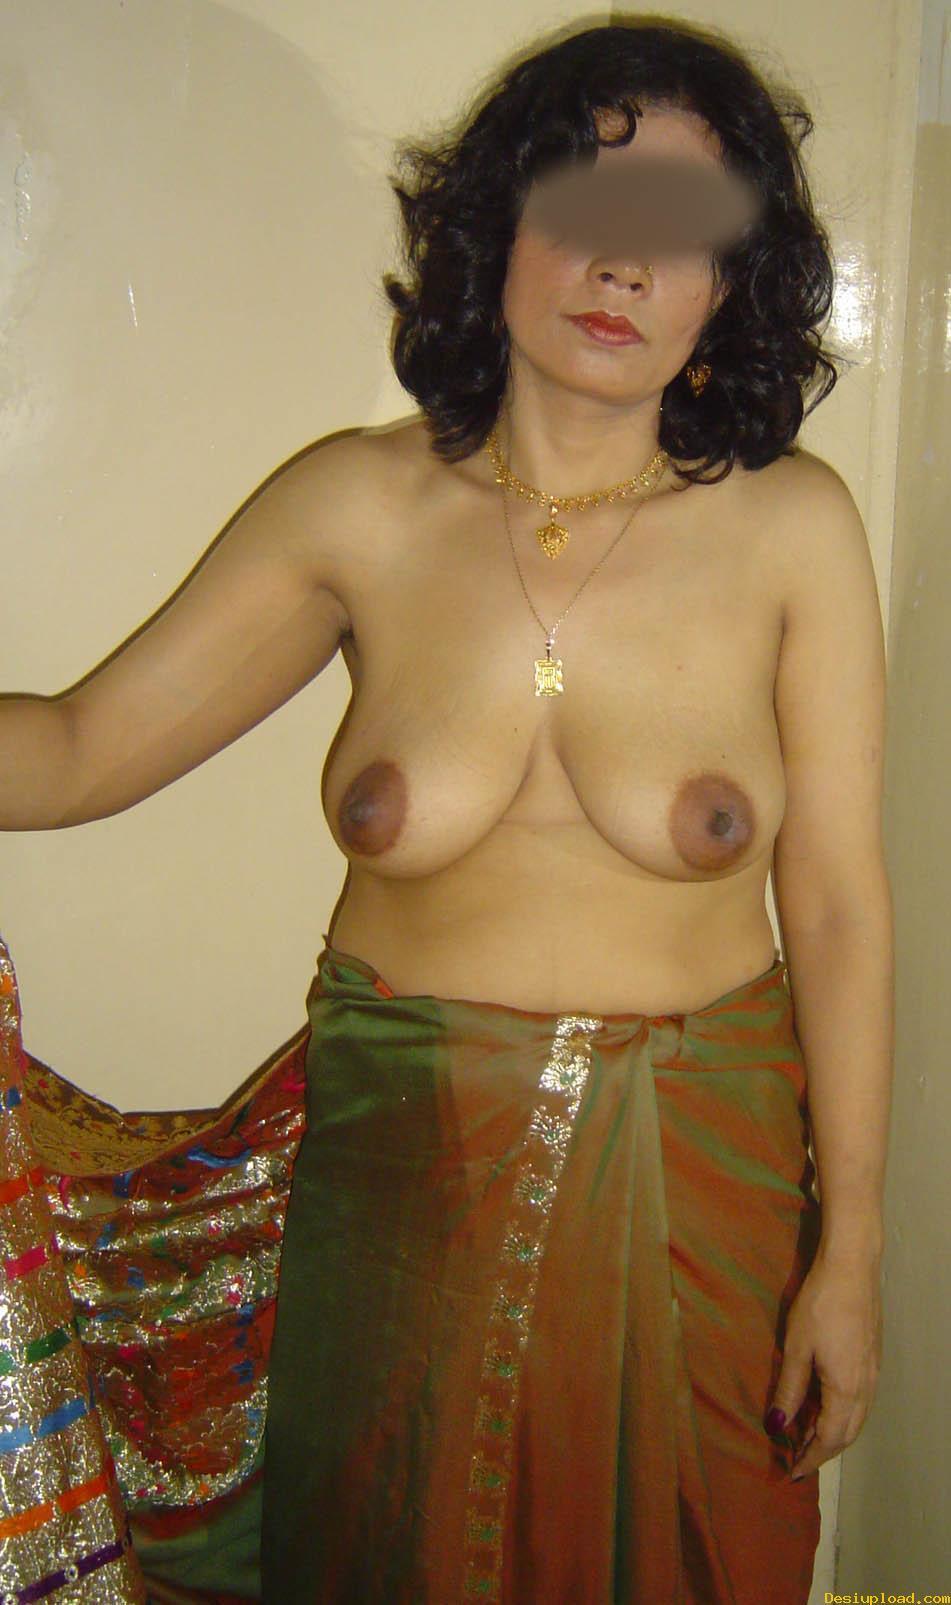 Bhabhi removing maxi petticoat posing nude boobs